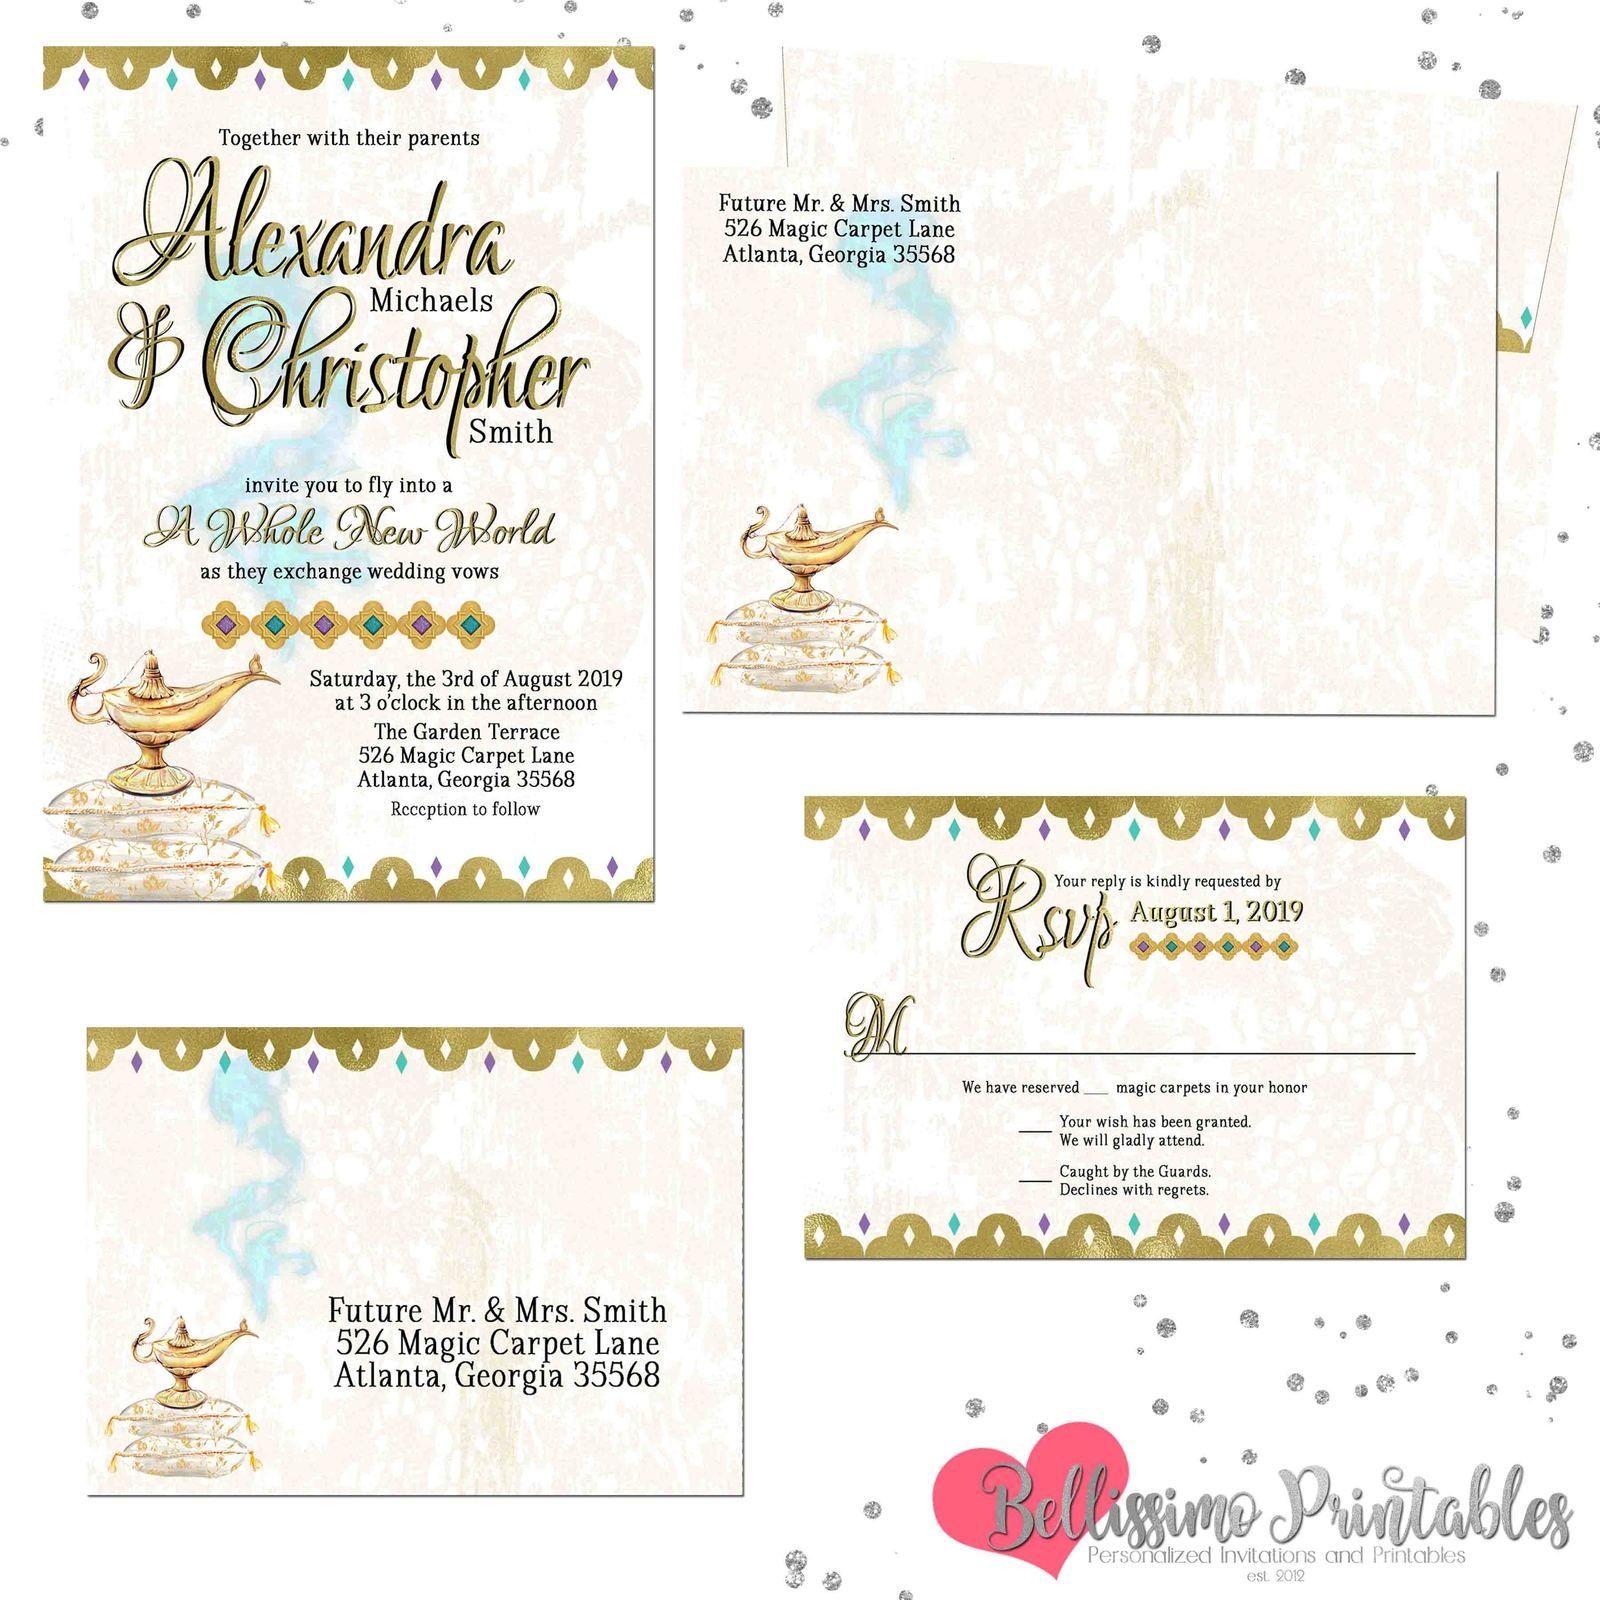 Arabian nights wedding invitation set with rsvp card and